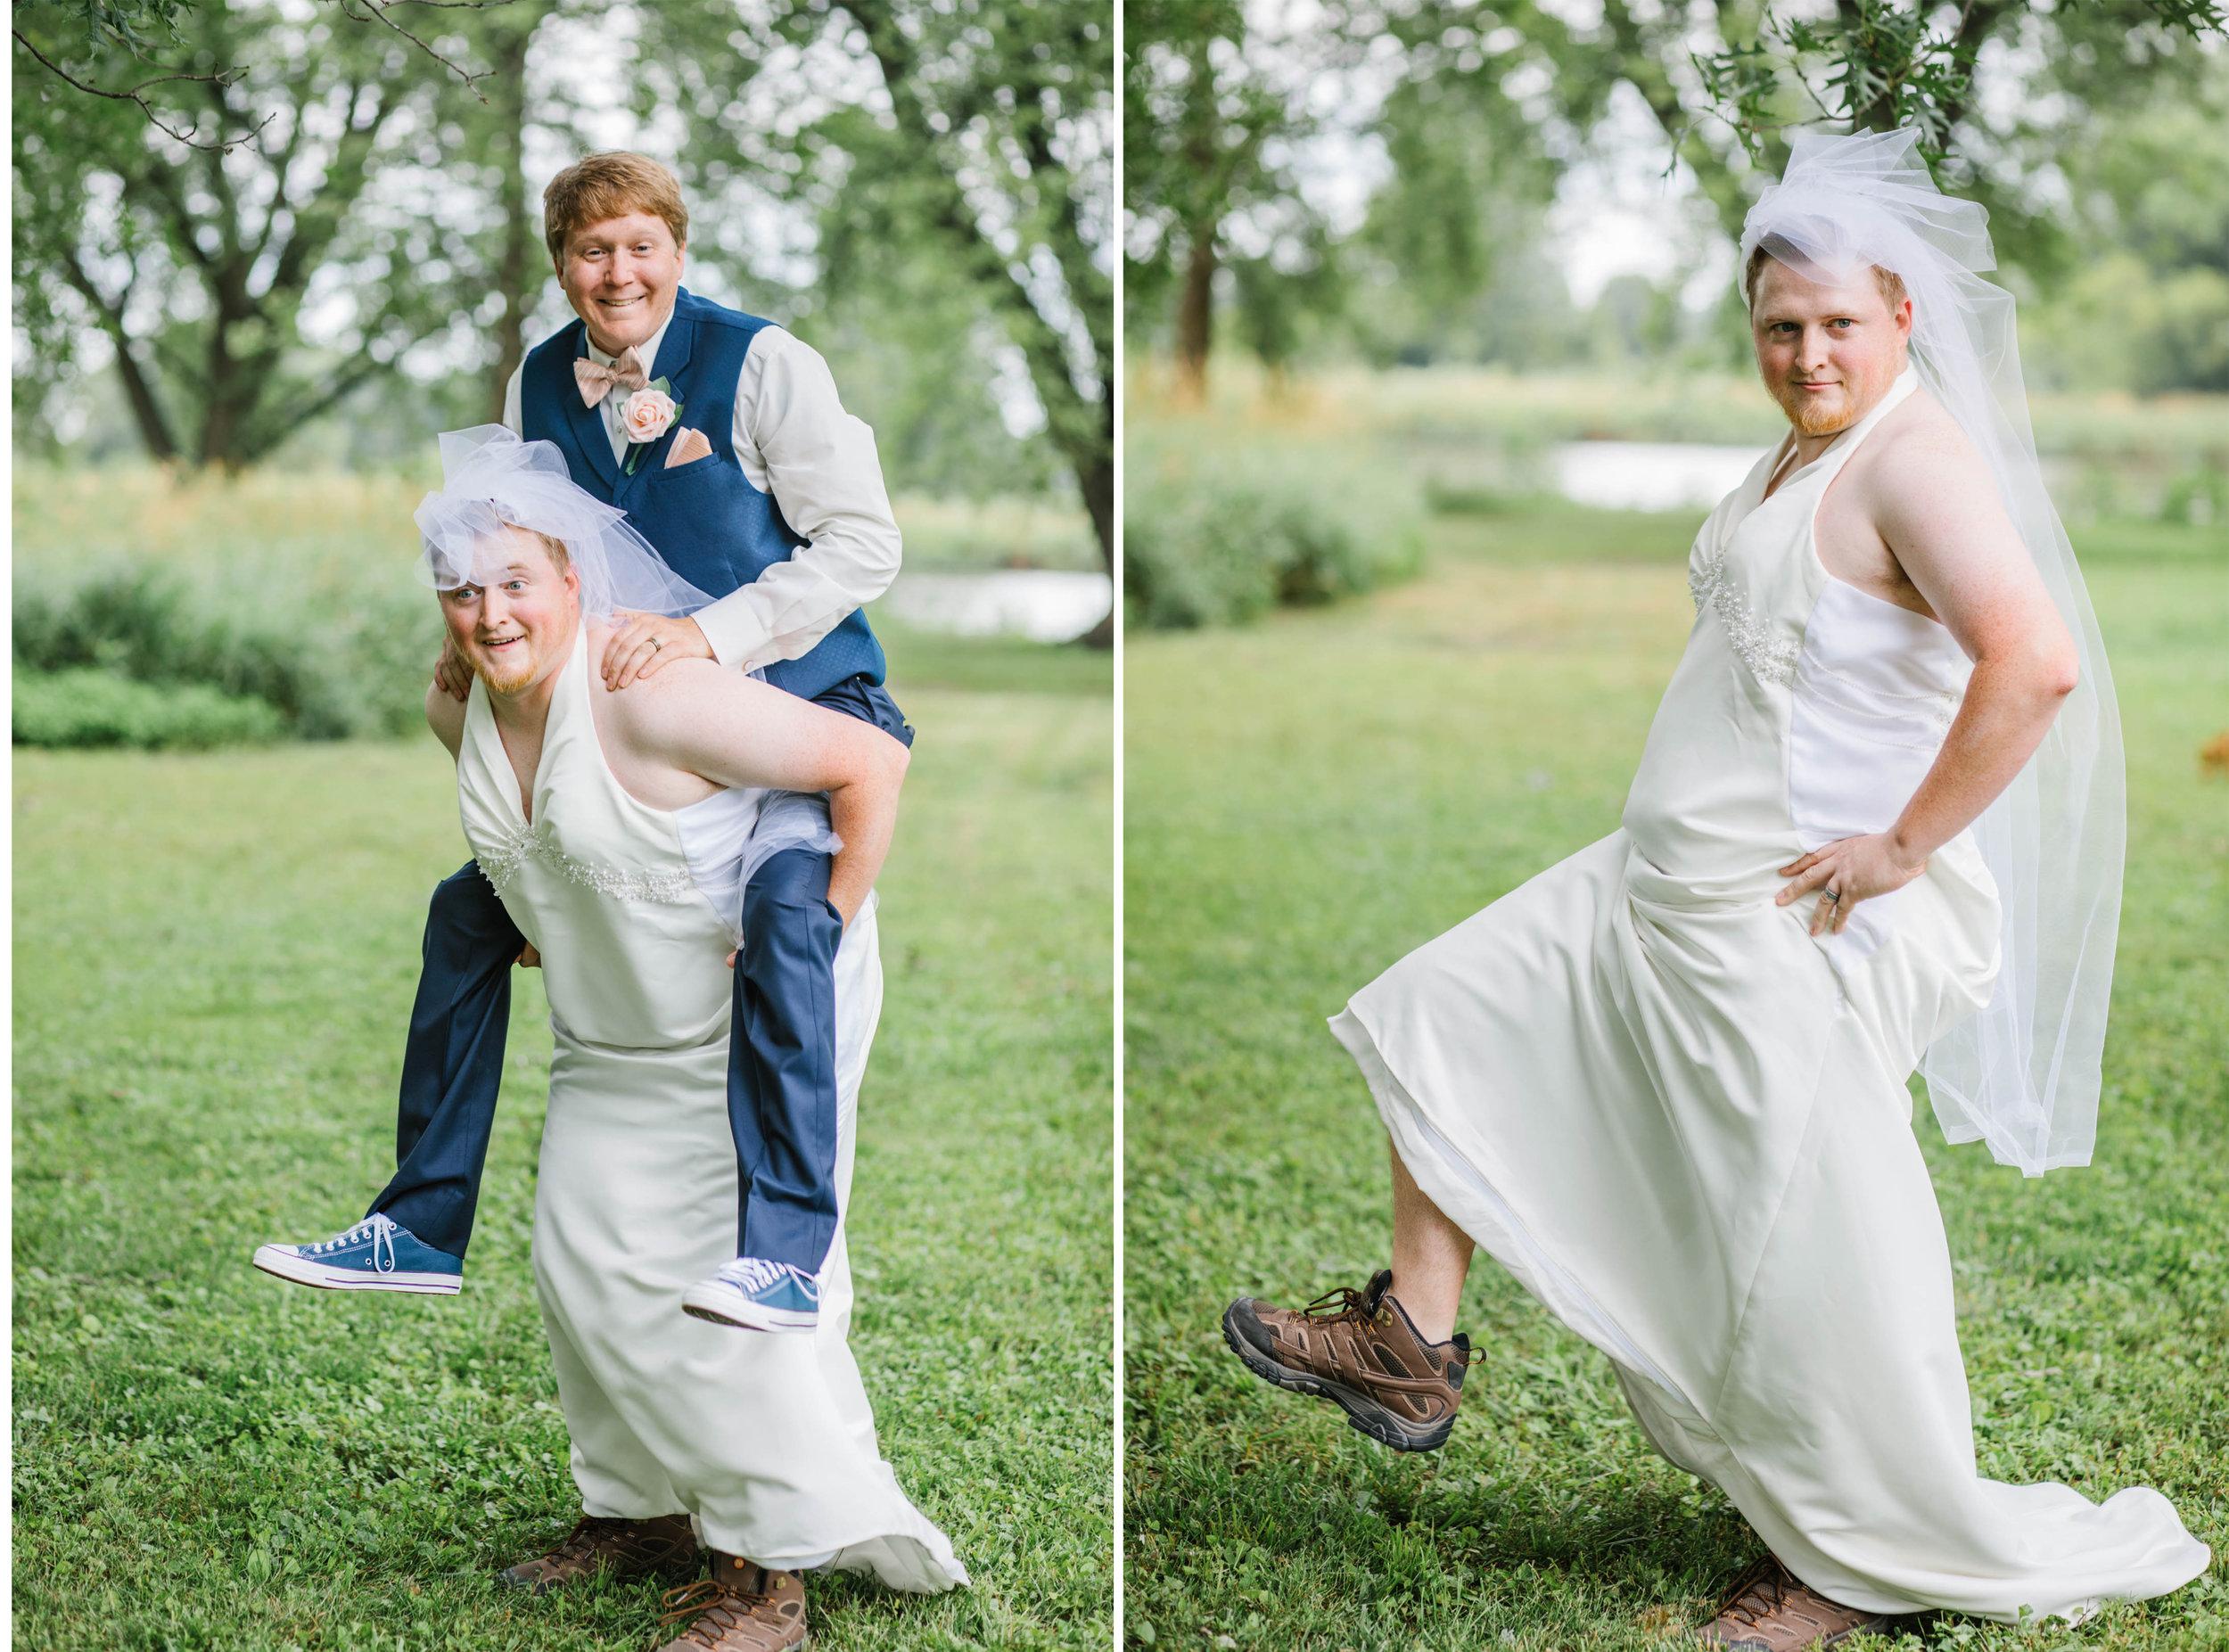 prank first look ideas iowa wedding phtoographer amelia renee